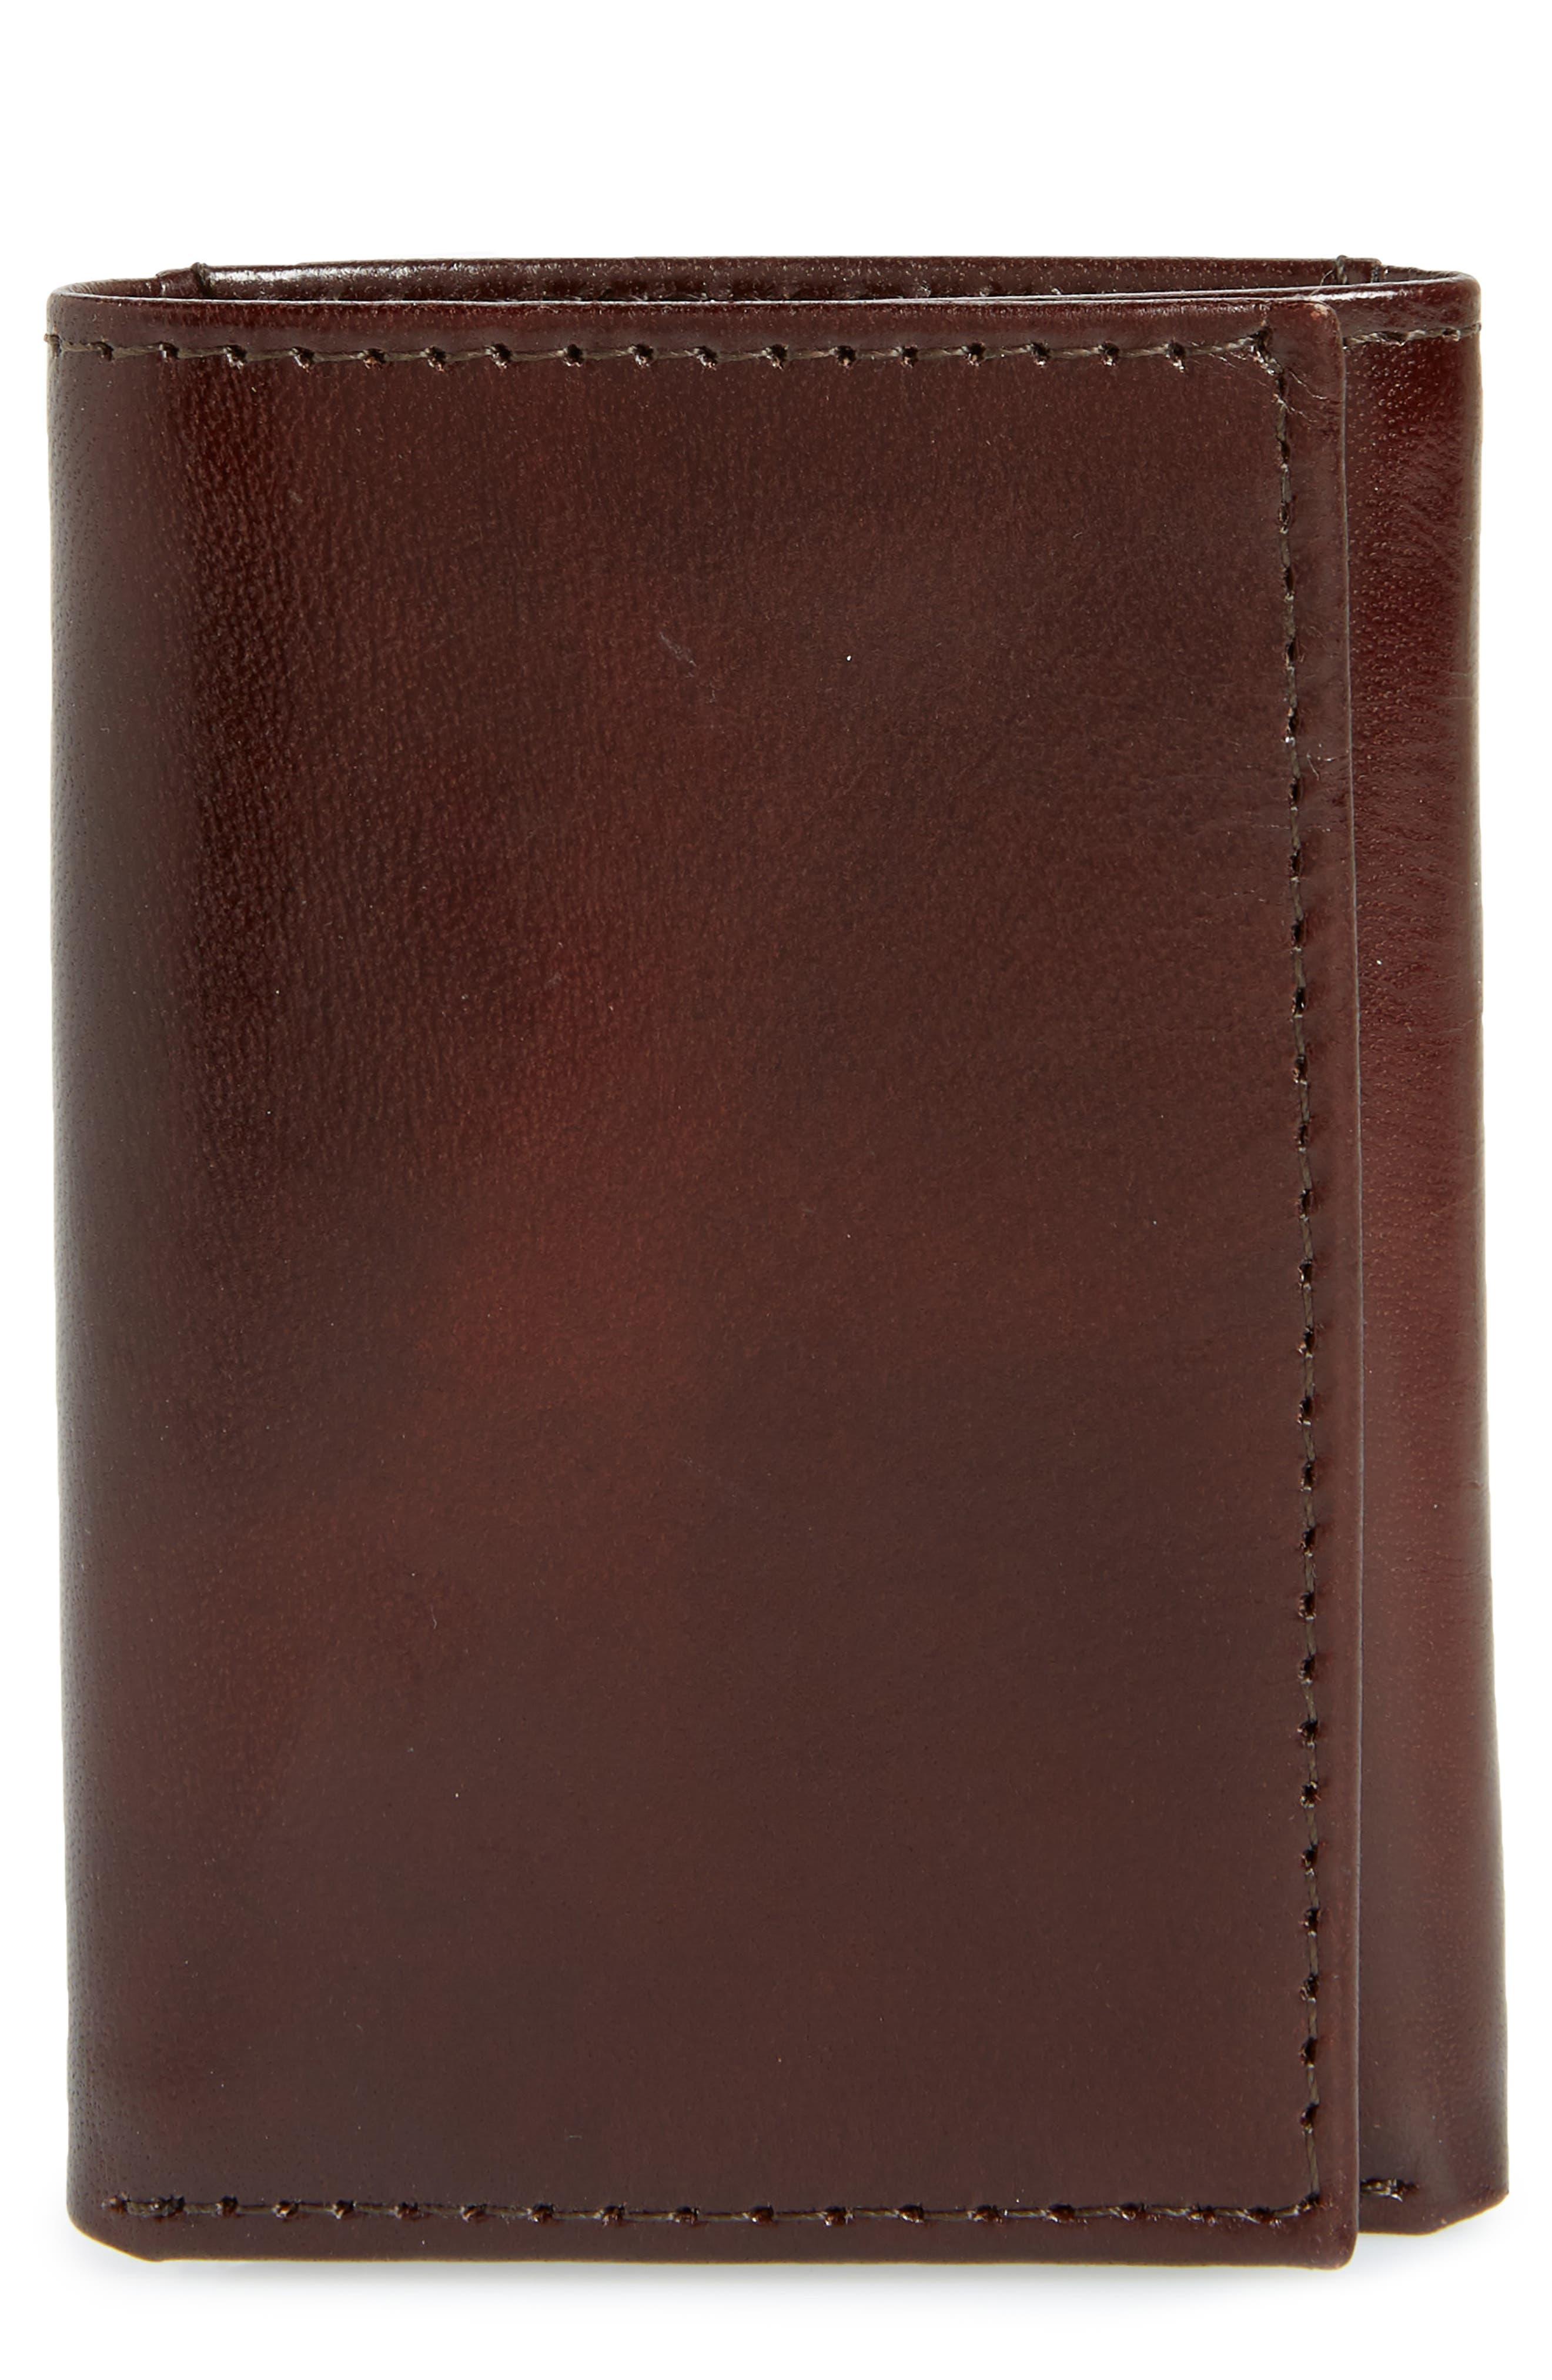 Alternate Image 1 Selected - Johnston & Murphy Leather Wallet